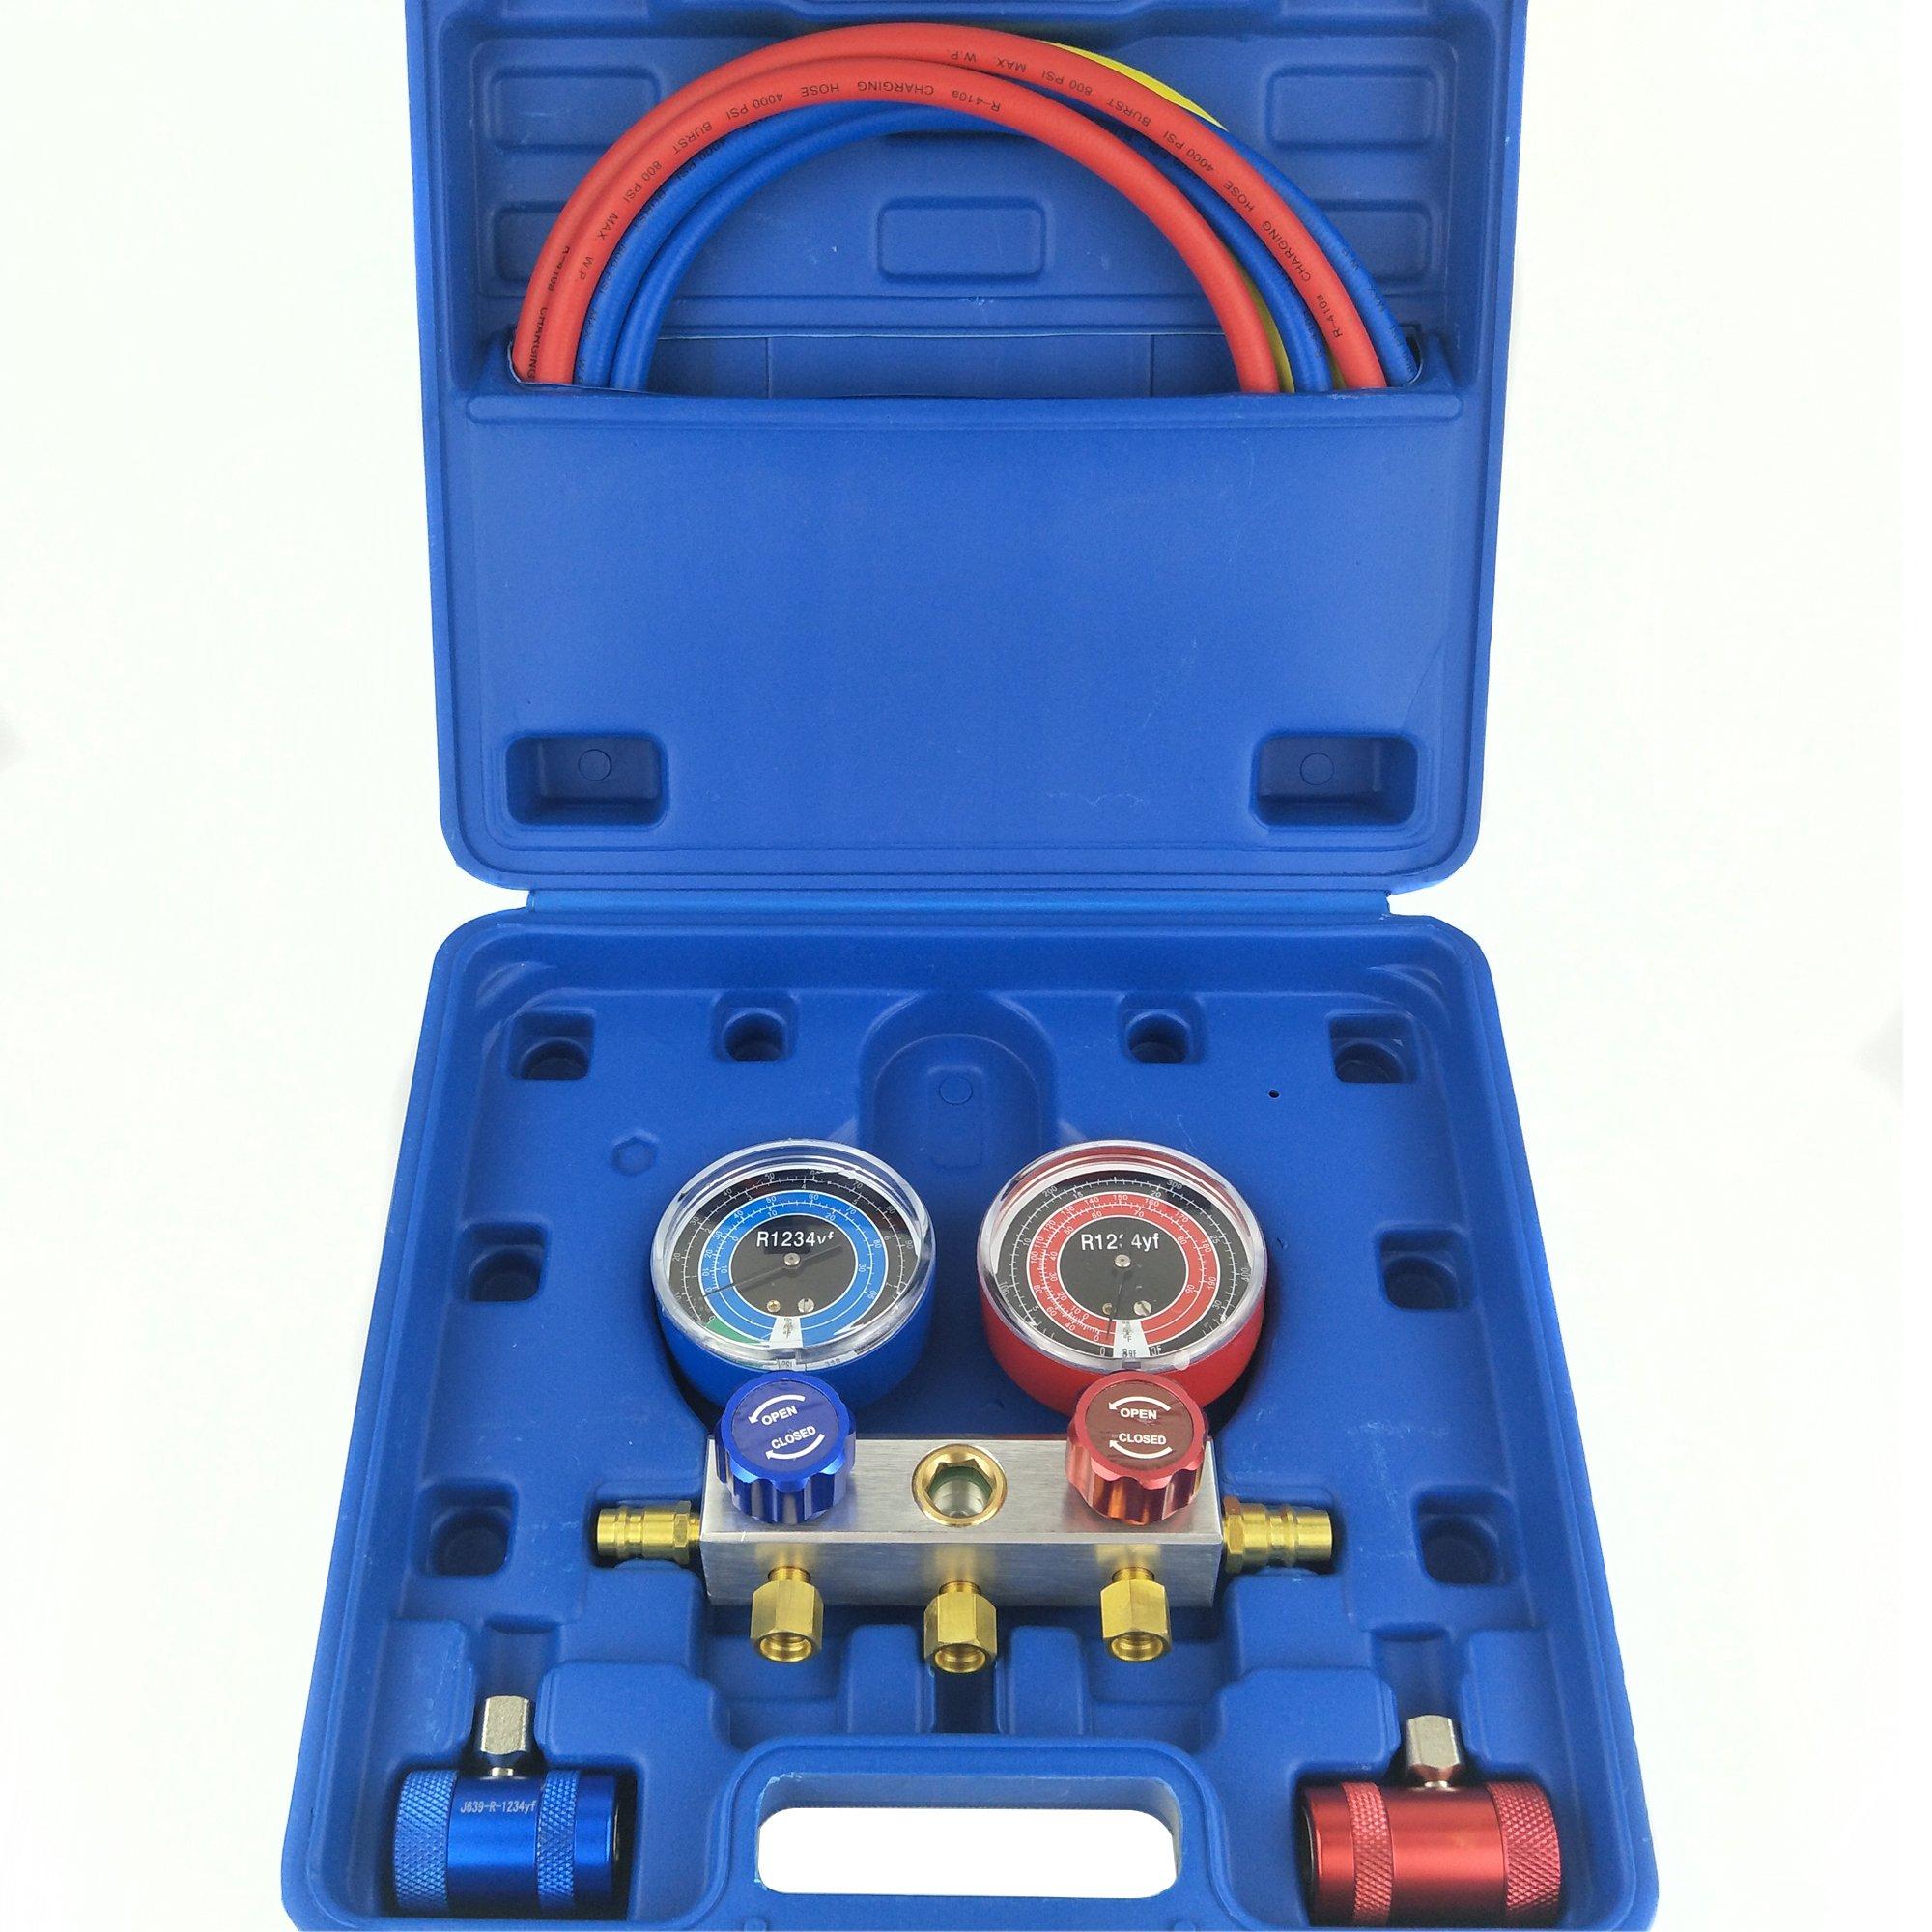 Wisepick AC Manifold Gauge Set R1234YF 3 Way HVAC Air Conditioning Refrigerant Diagnostic Tool Kit